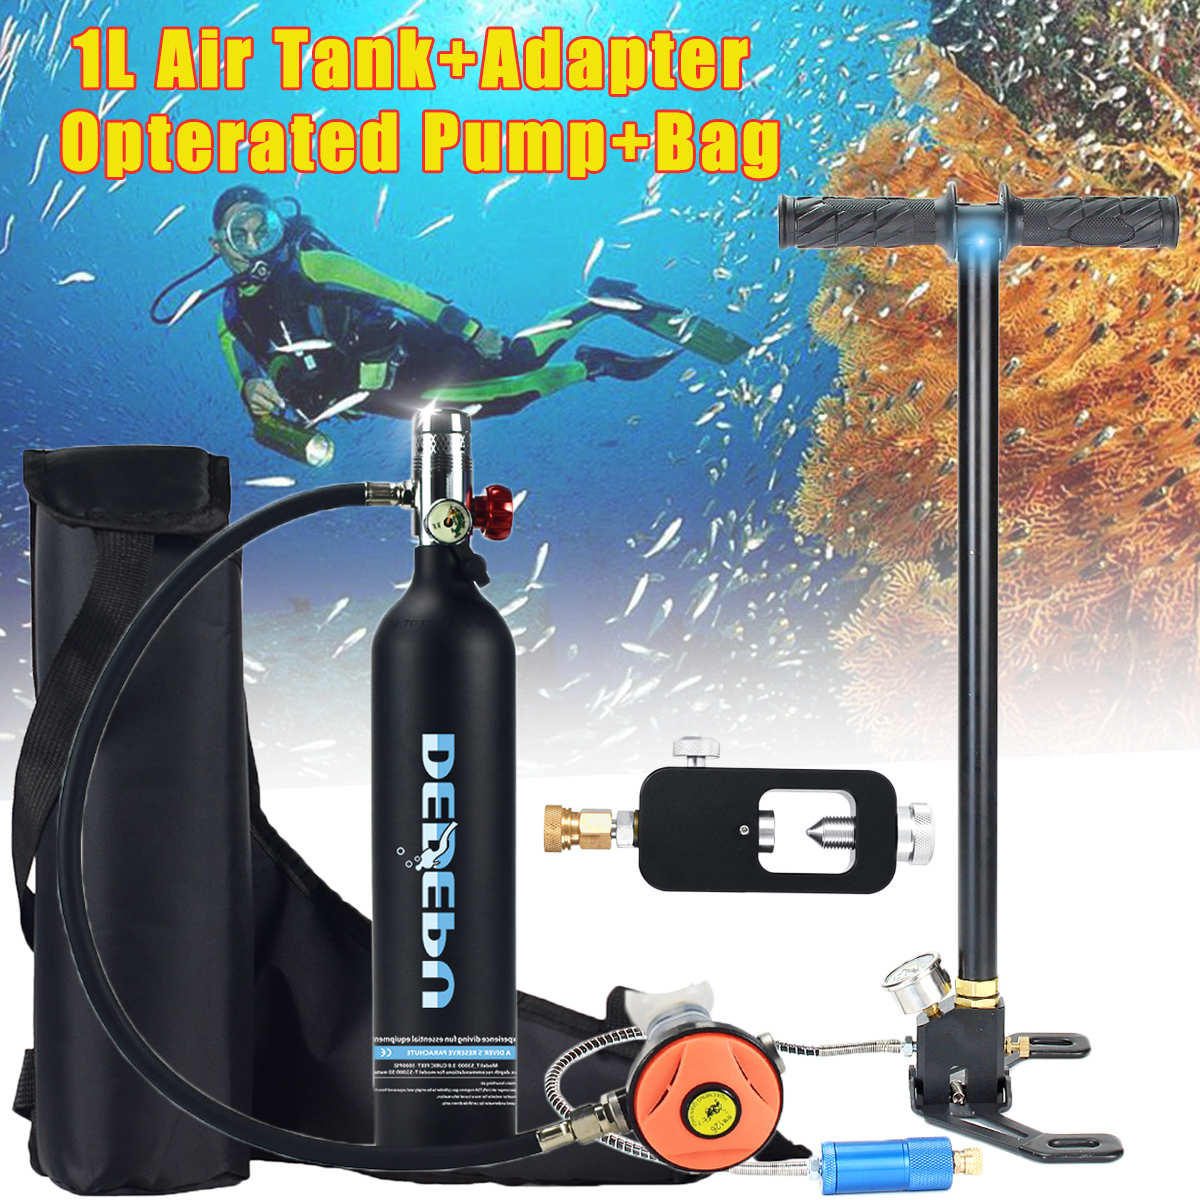 Equipo de Buceo 1L, cilindro de buceo, tanque de oxígeno, respirador, adaptador de repuesto, bomba de alta presión, accesorios de respiración de buceo